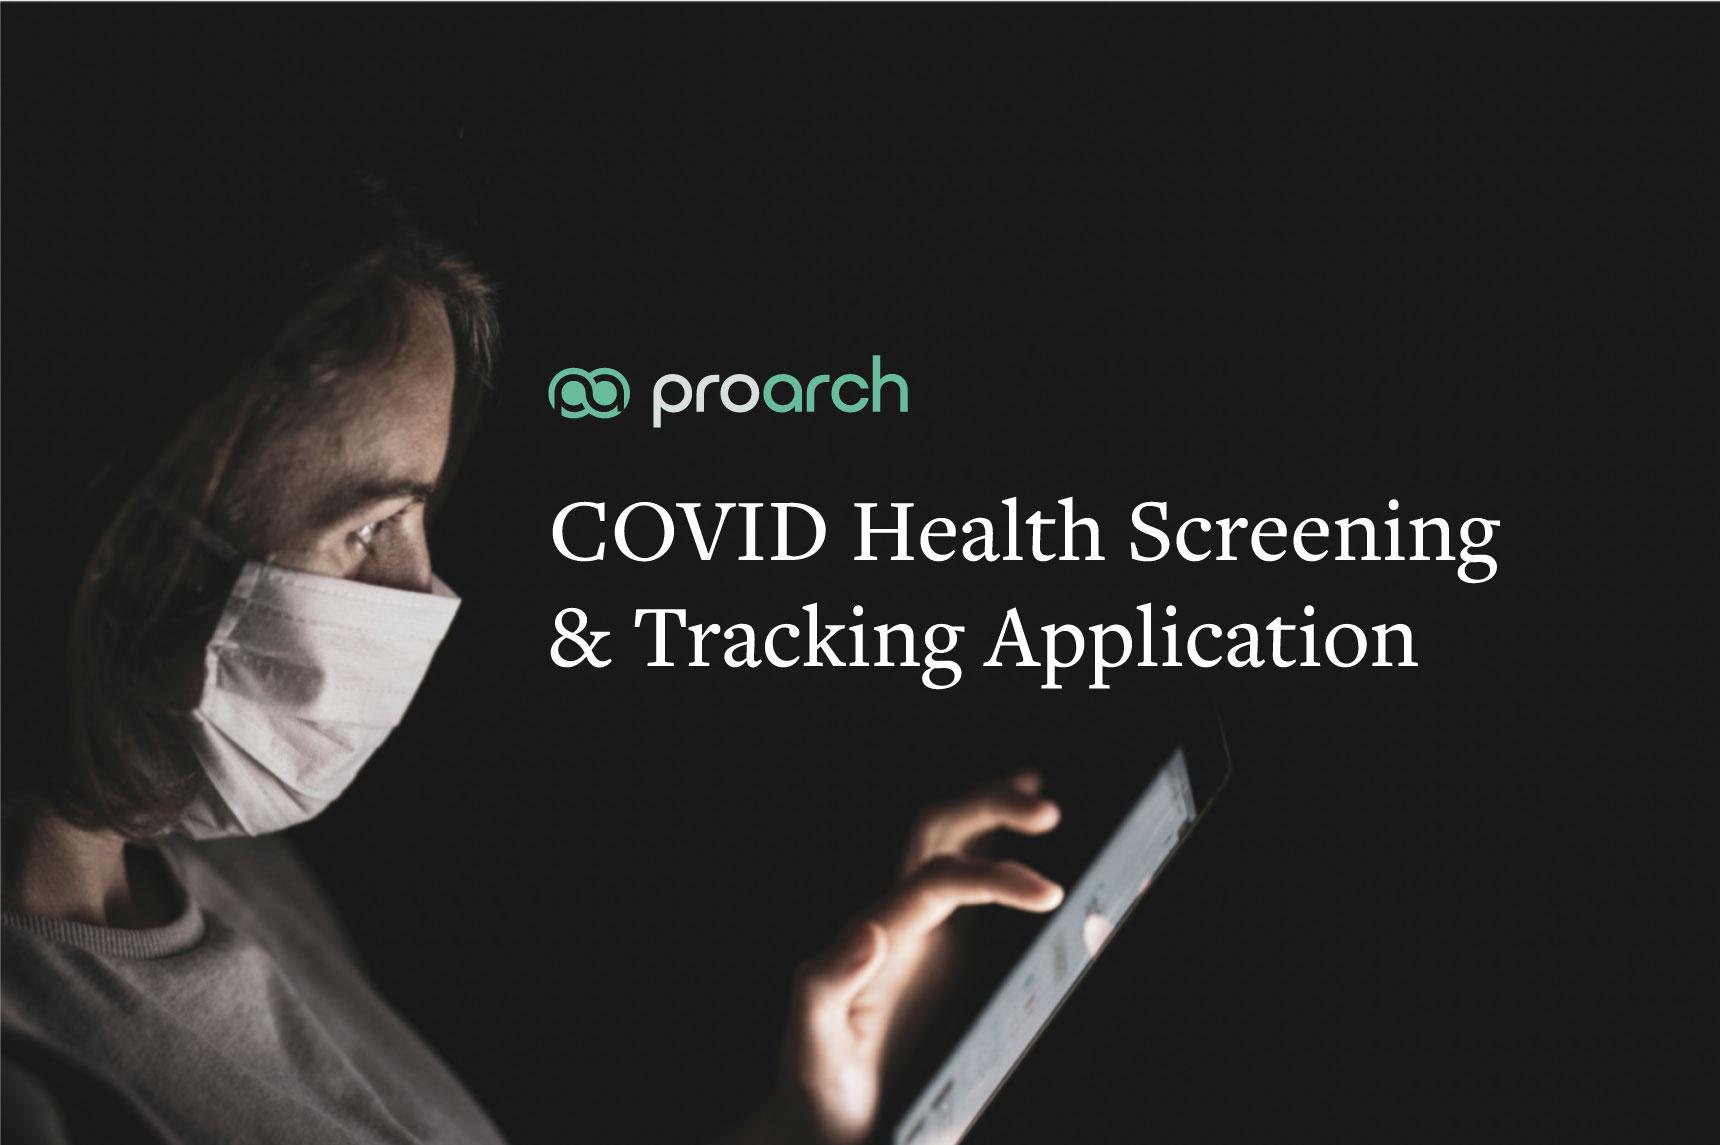 health screening application